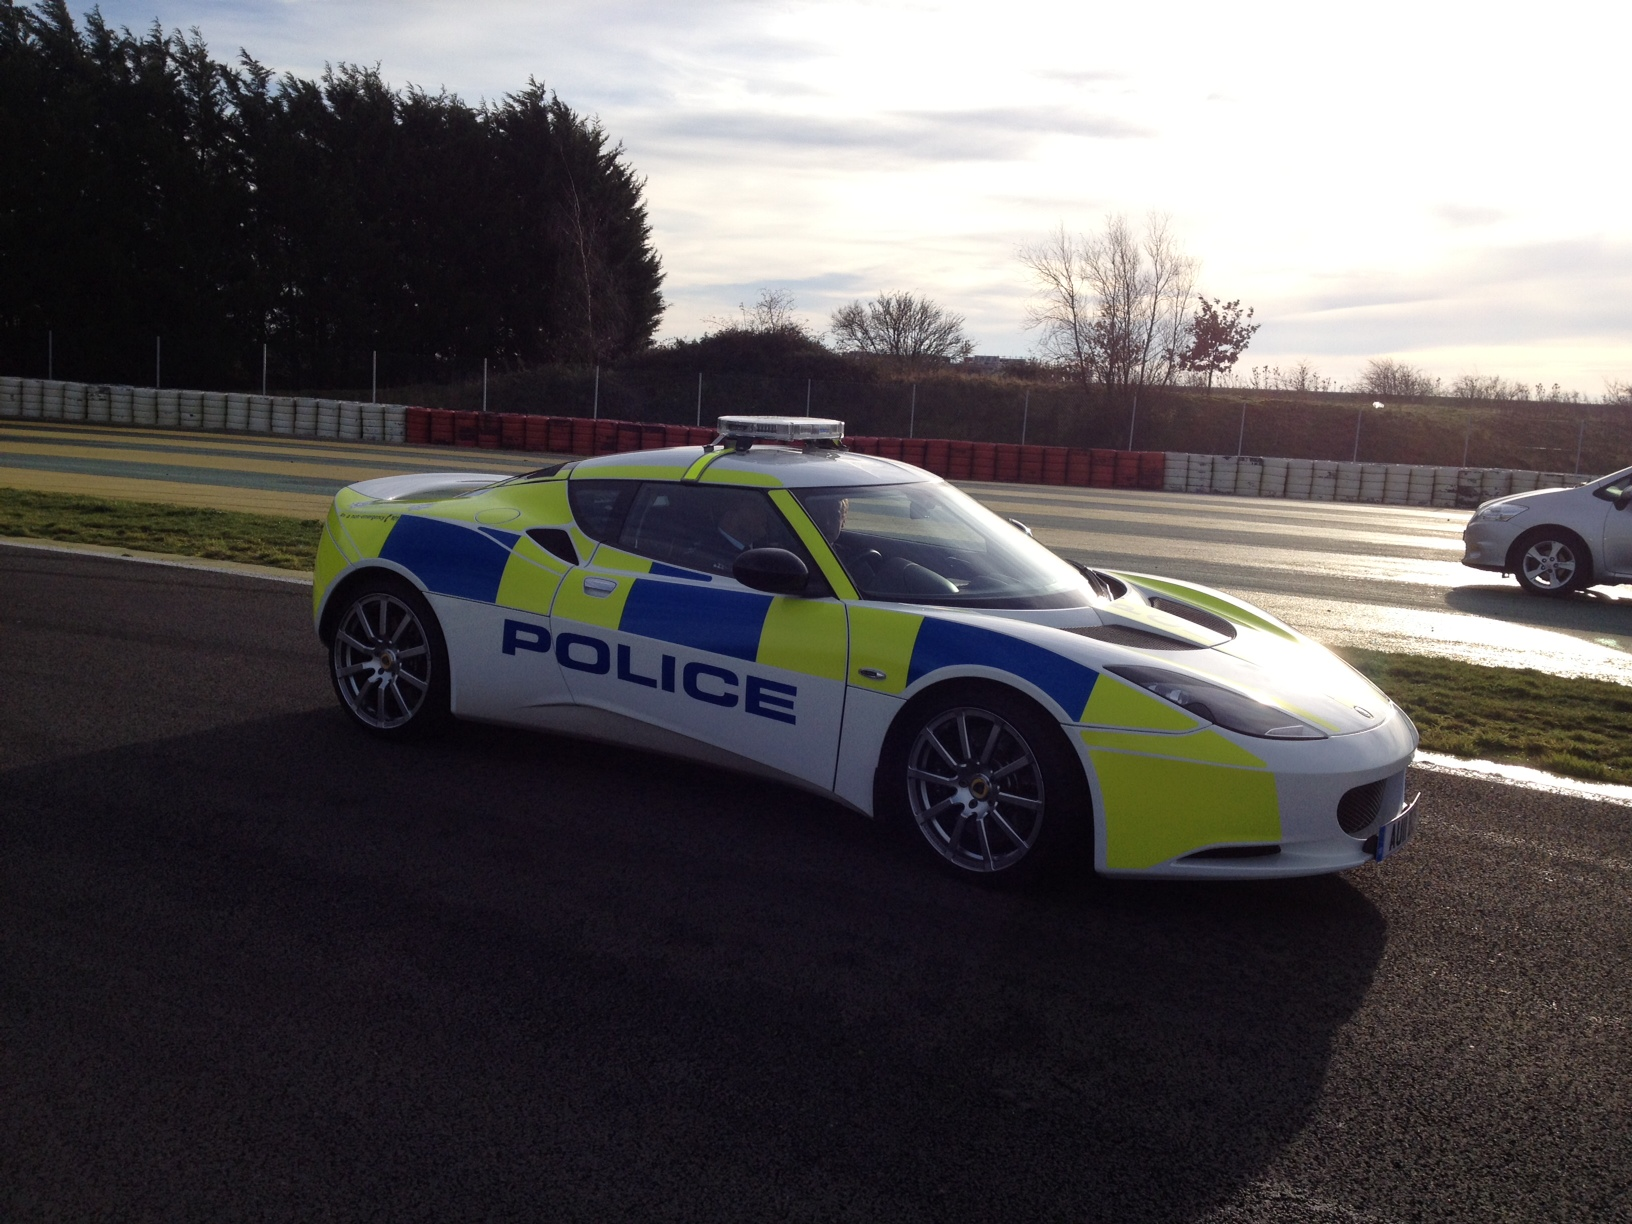 Police lotus car